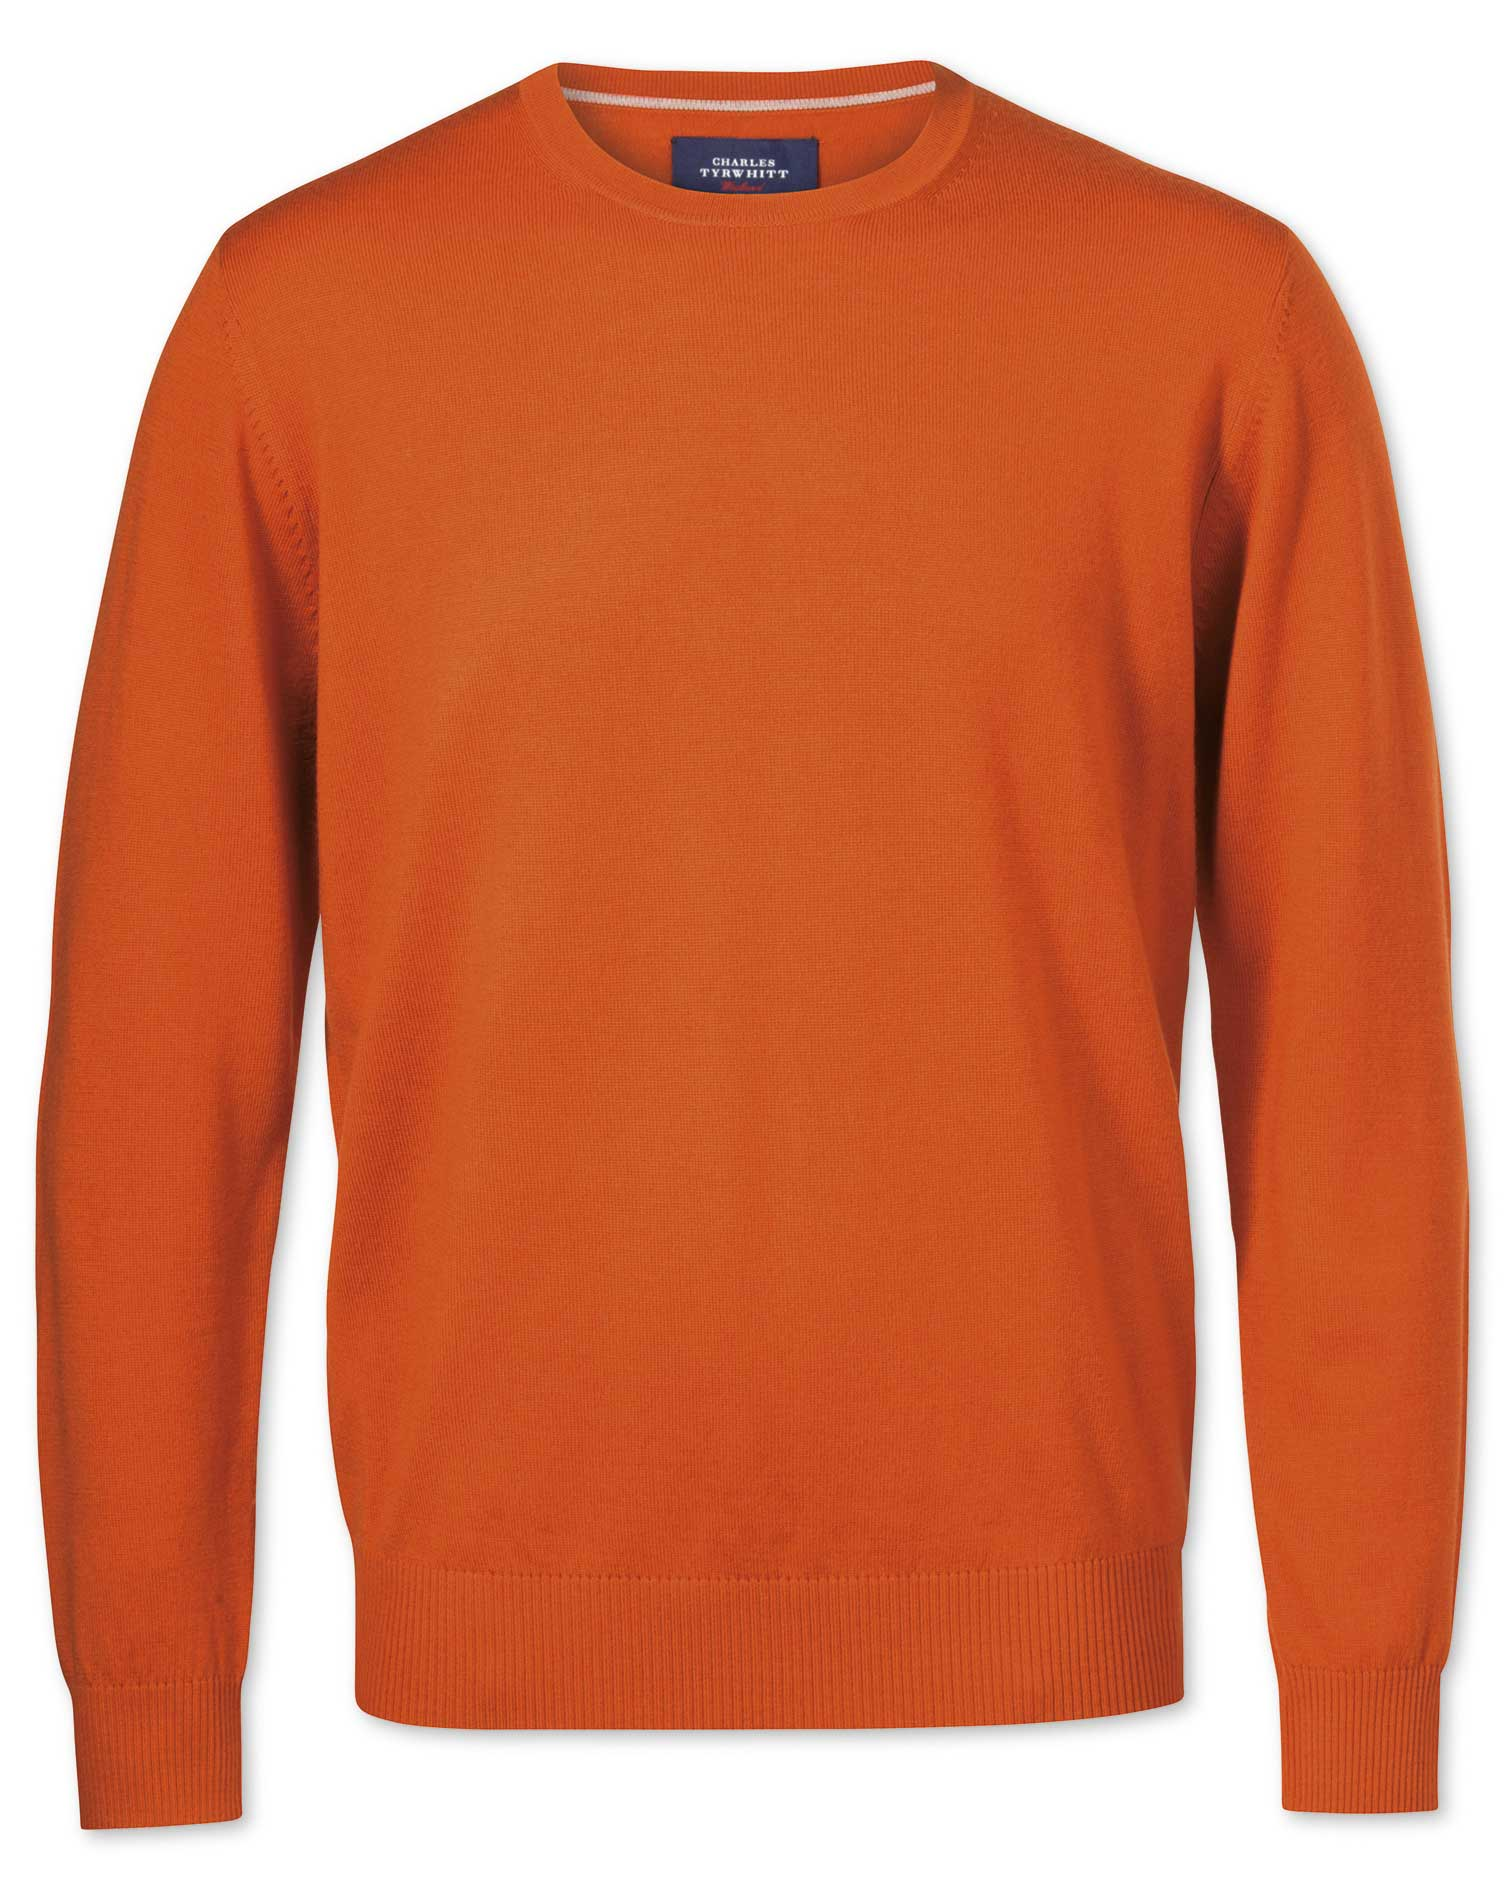 Orange Merino Crew Neck Wool Jumper Size XL by Charles Tyrwhitt